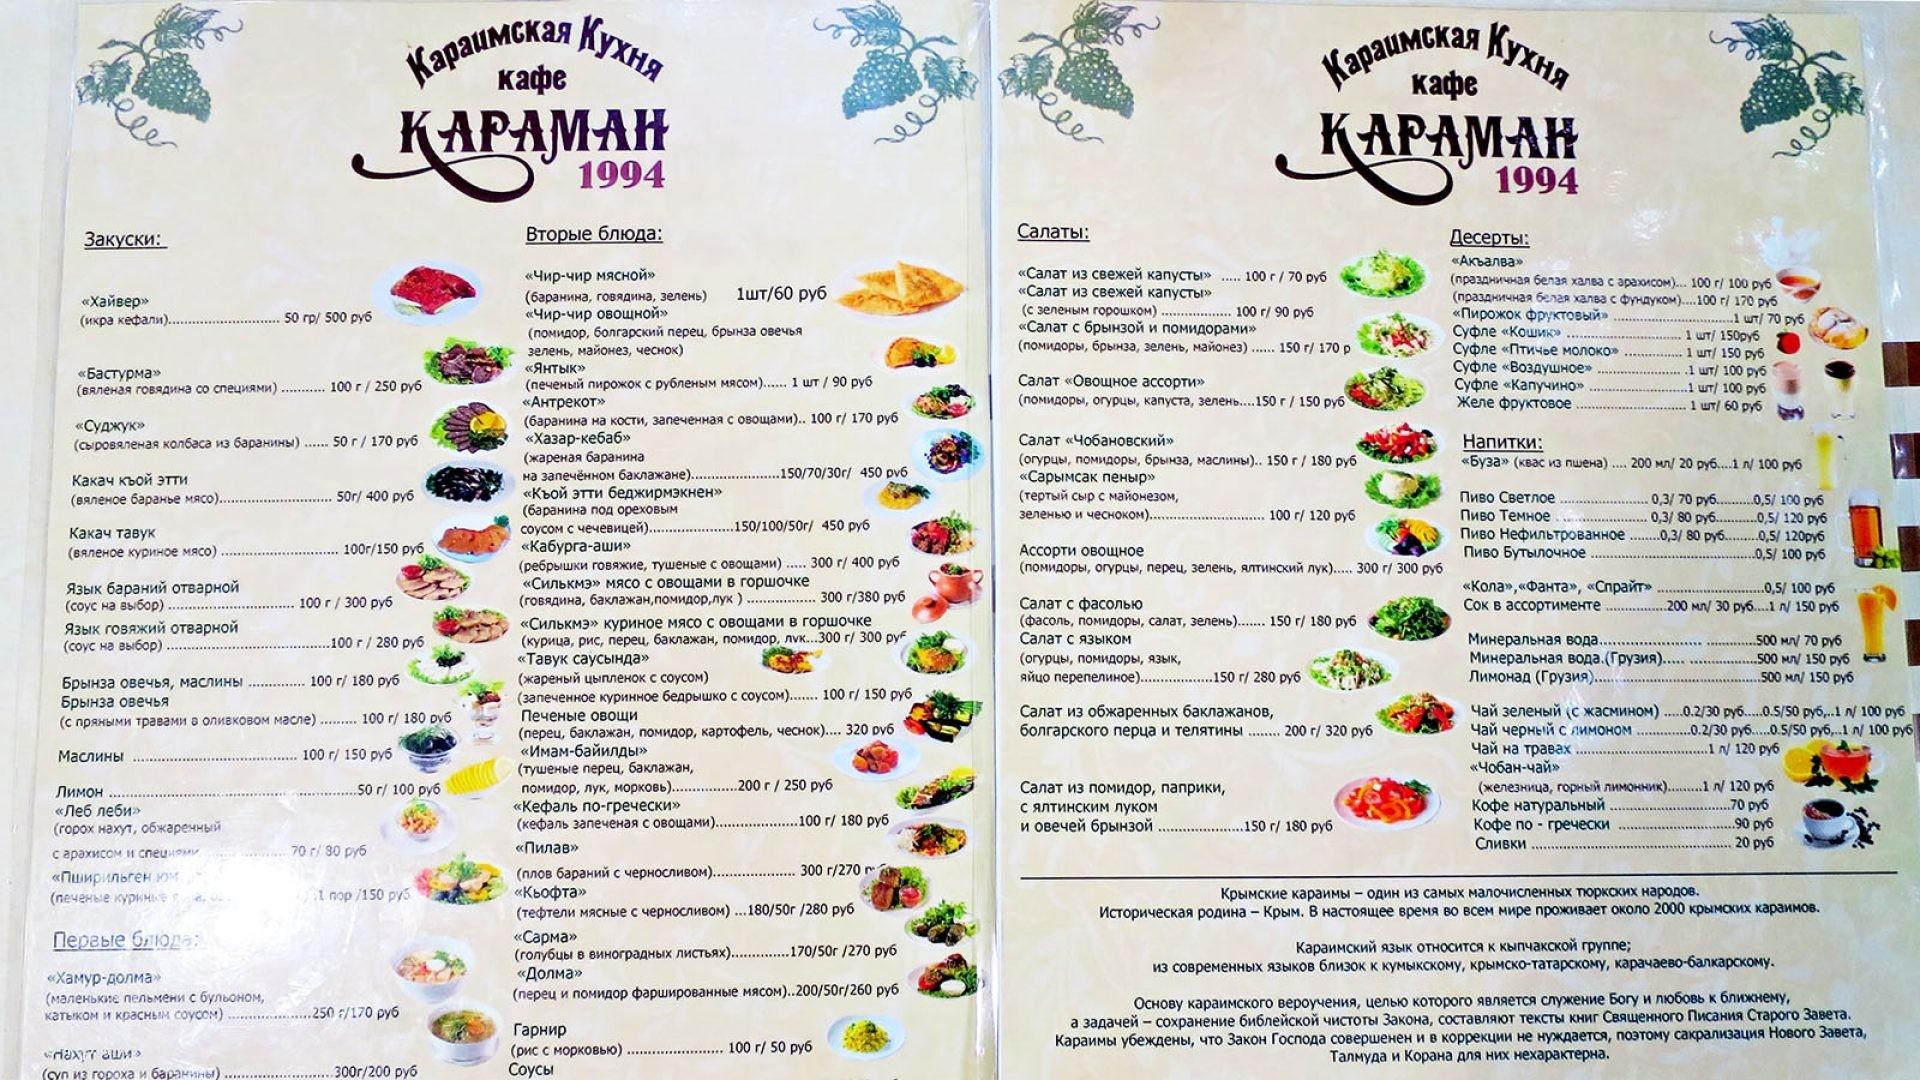 Караимская кухня в кафе Караман